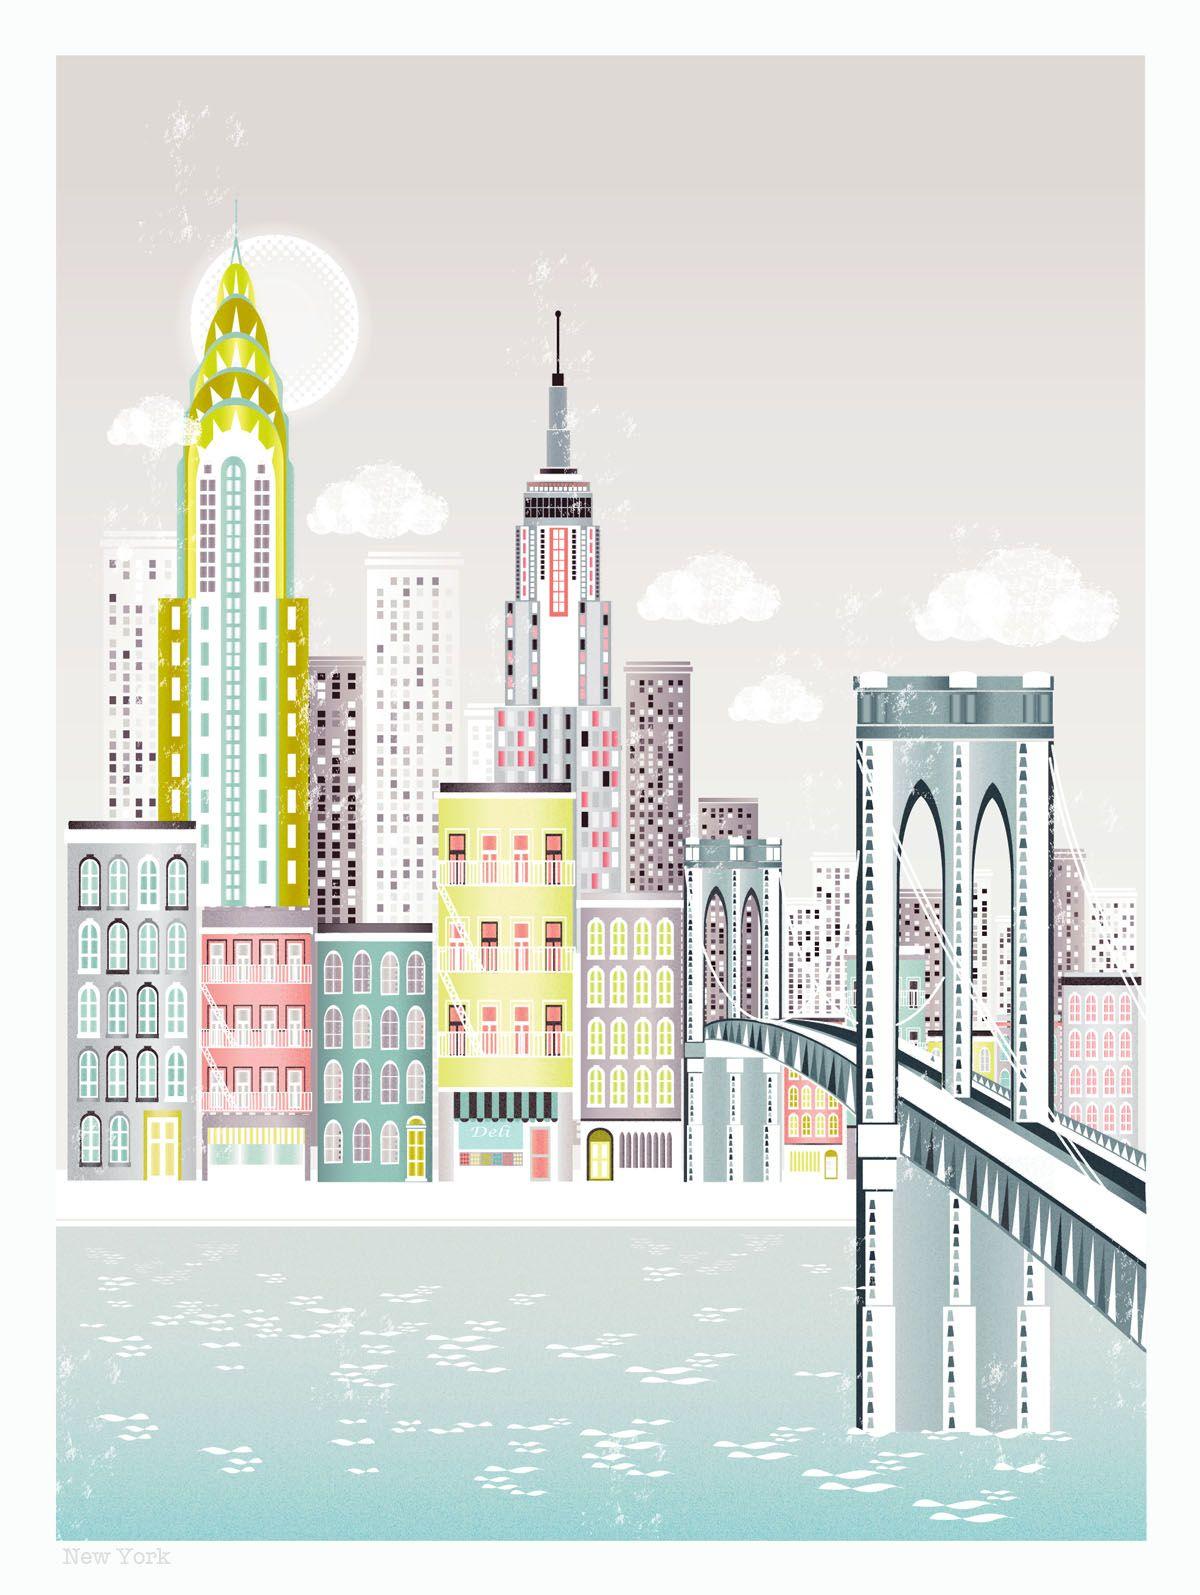 New York Wall Art City Skyline Art New York Print Manhattan Print City Skyline Art New York Illustration New York Art